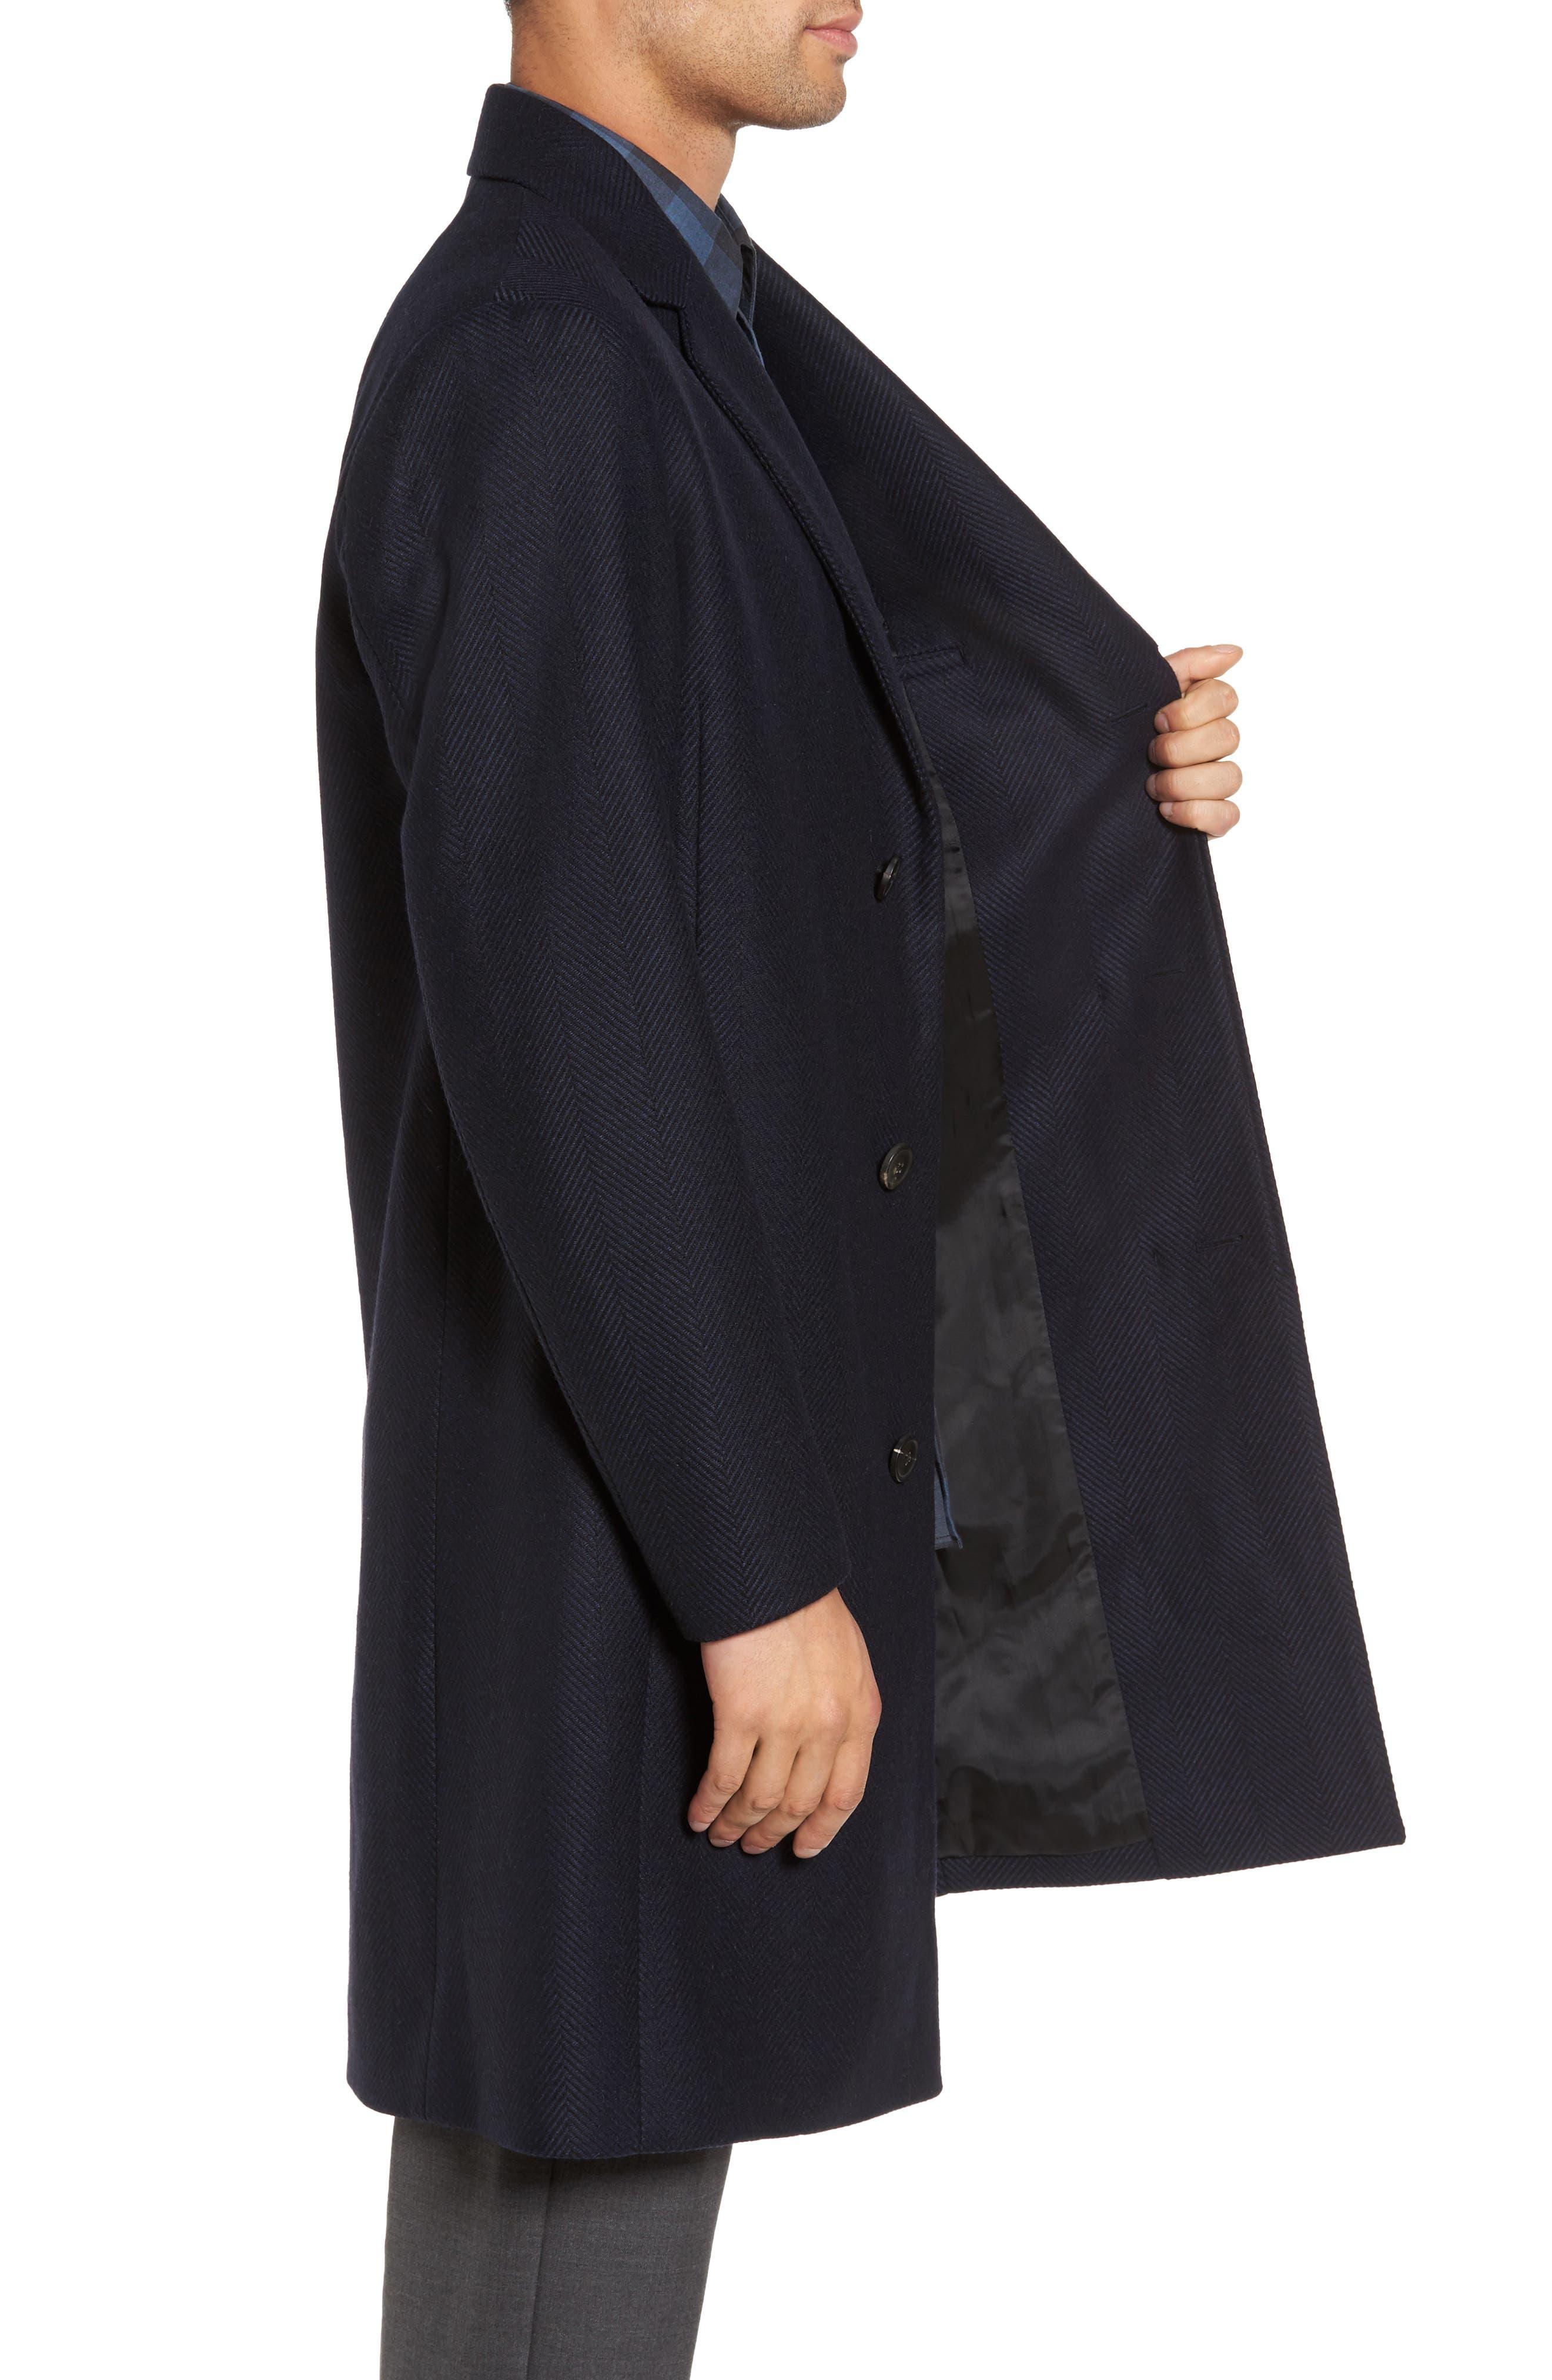 Bower Herringbone Wool Blend Topcoat,                             Alternate thumbnail 3, color,                             Liberty Multi